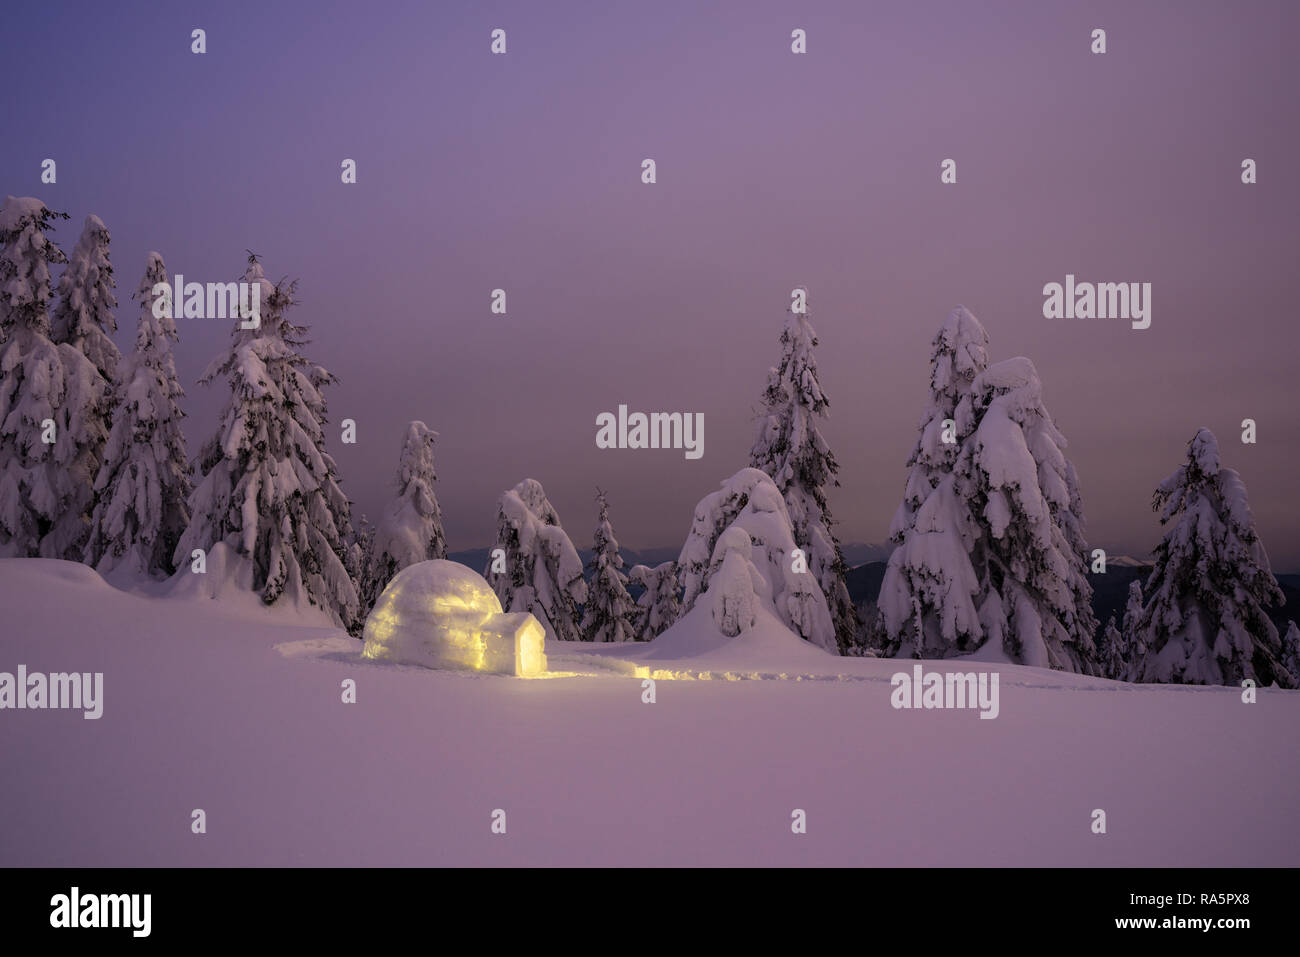 Eskimo Igloo Stock Photos & Eskimo Igloo Stock Images - Alamy